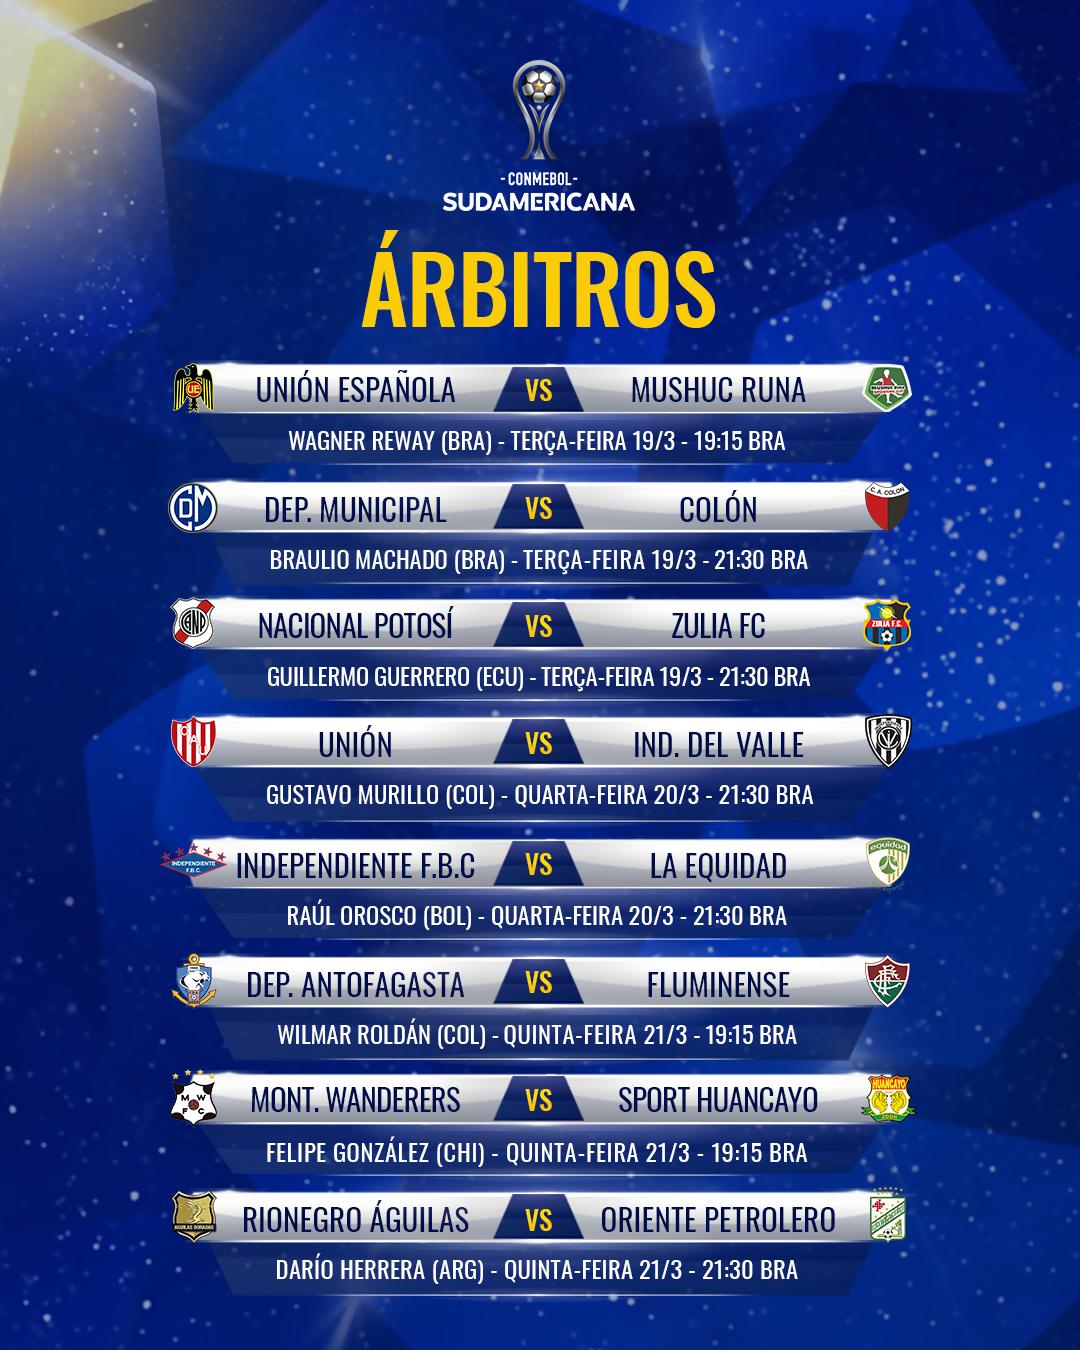 Arbitragem Sul-Americana